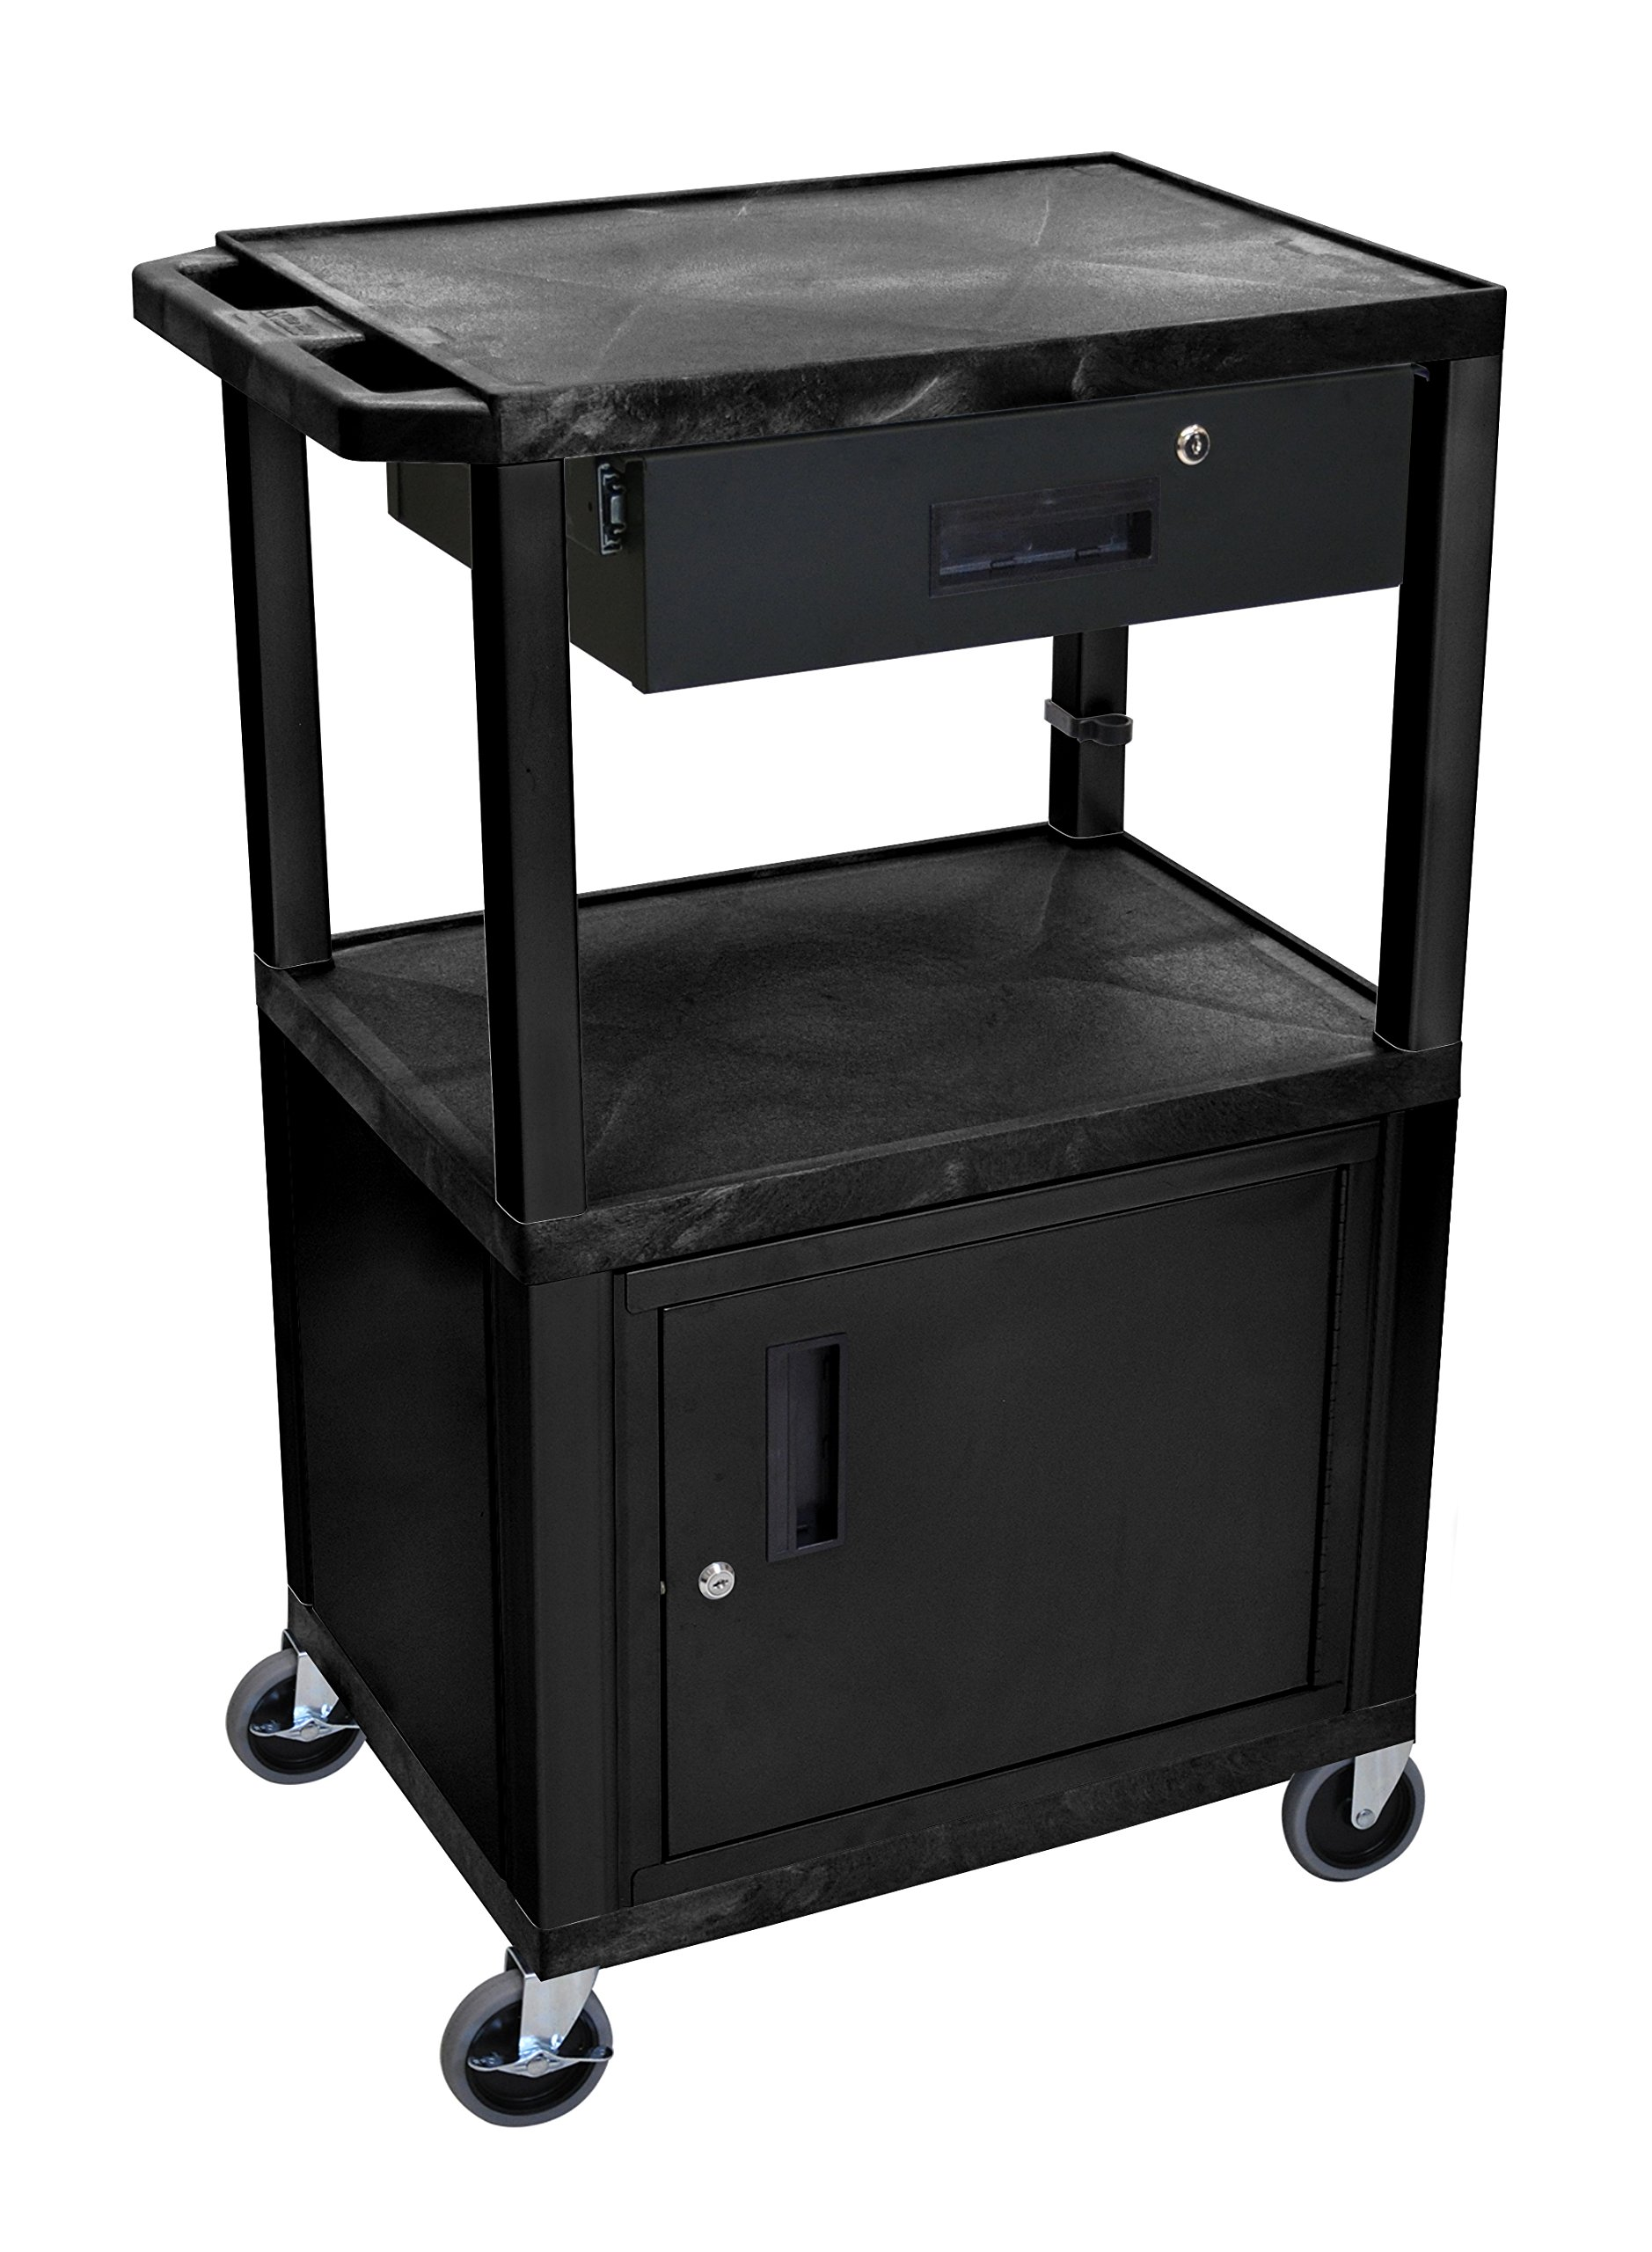 Wilson Tuffy Utility Cart with Locking Cabinet - 300-Lb. Capacity, 42in.H, Black, Model# WT42C2E-B/WTD